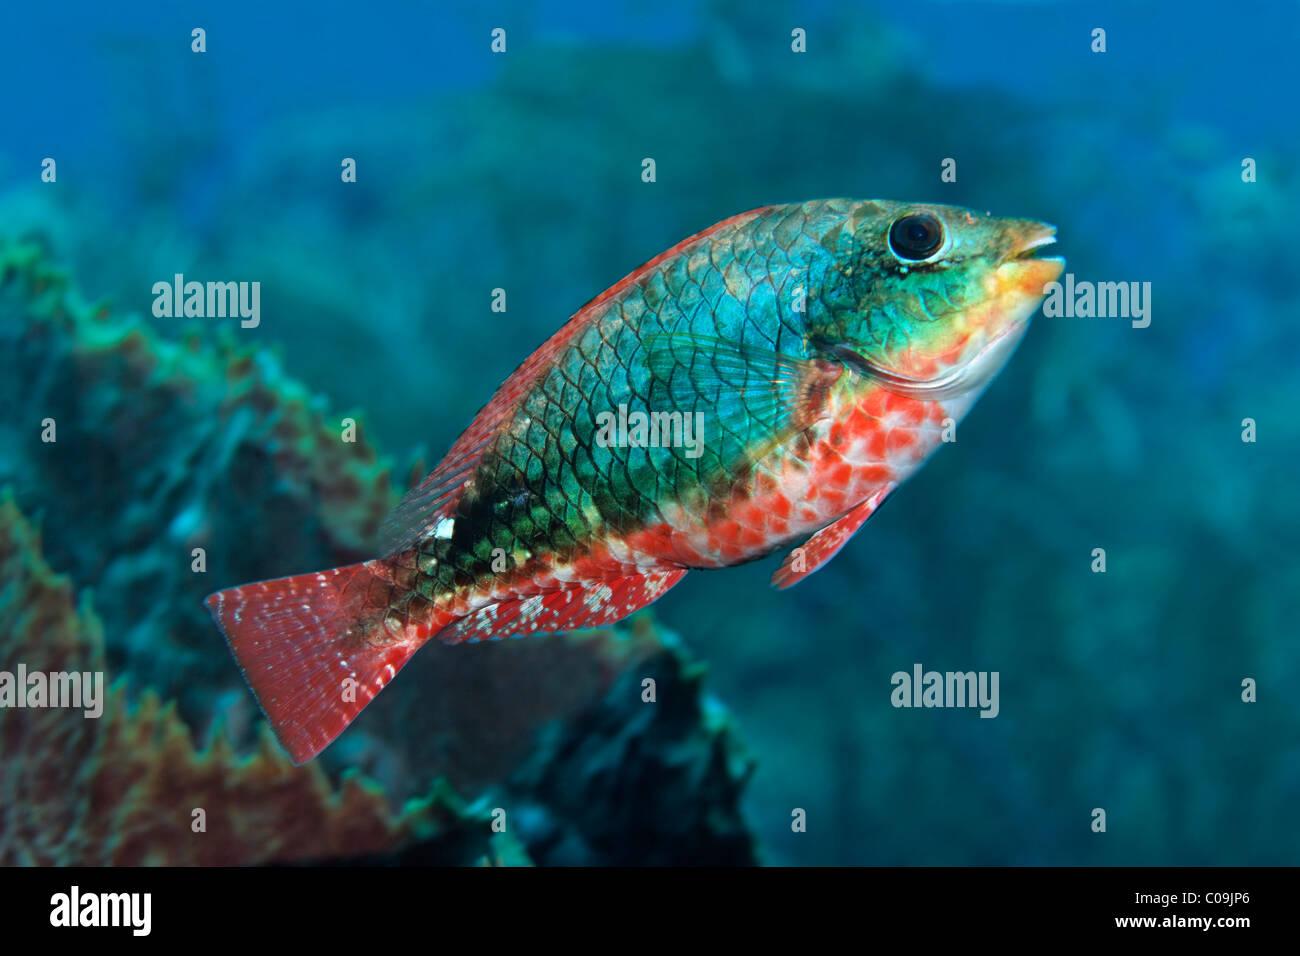 Redband Parrotfish (Sparisoma aurofrenatum), Little Tobago, Speyside, Trinidad and Tobago, Lesser Antilles, Caribbean - Stock Image